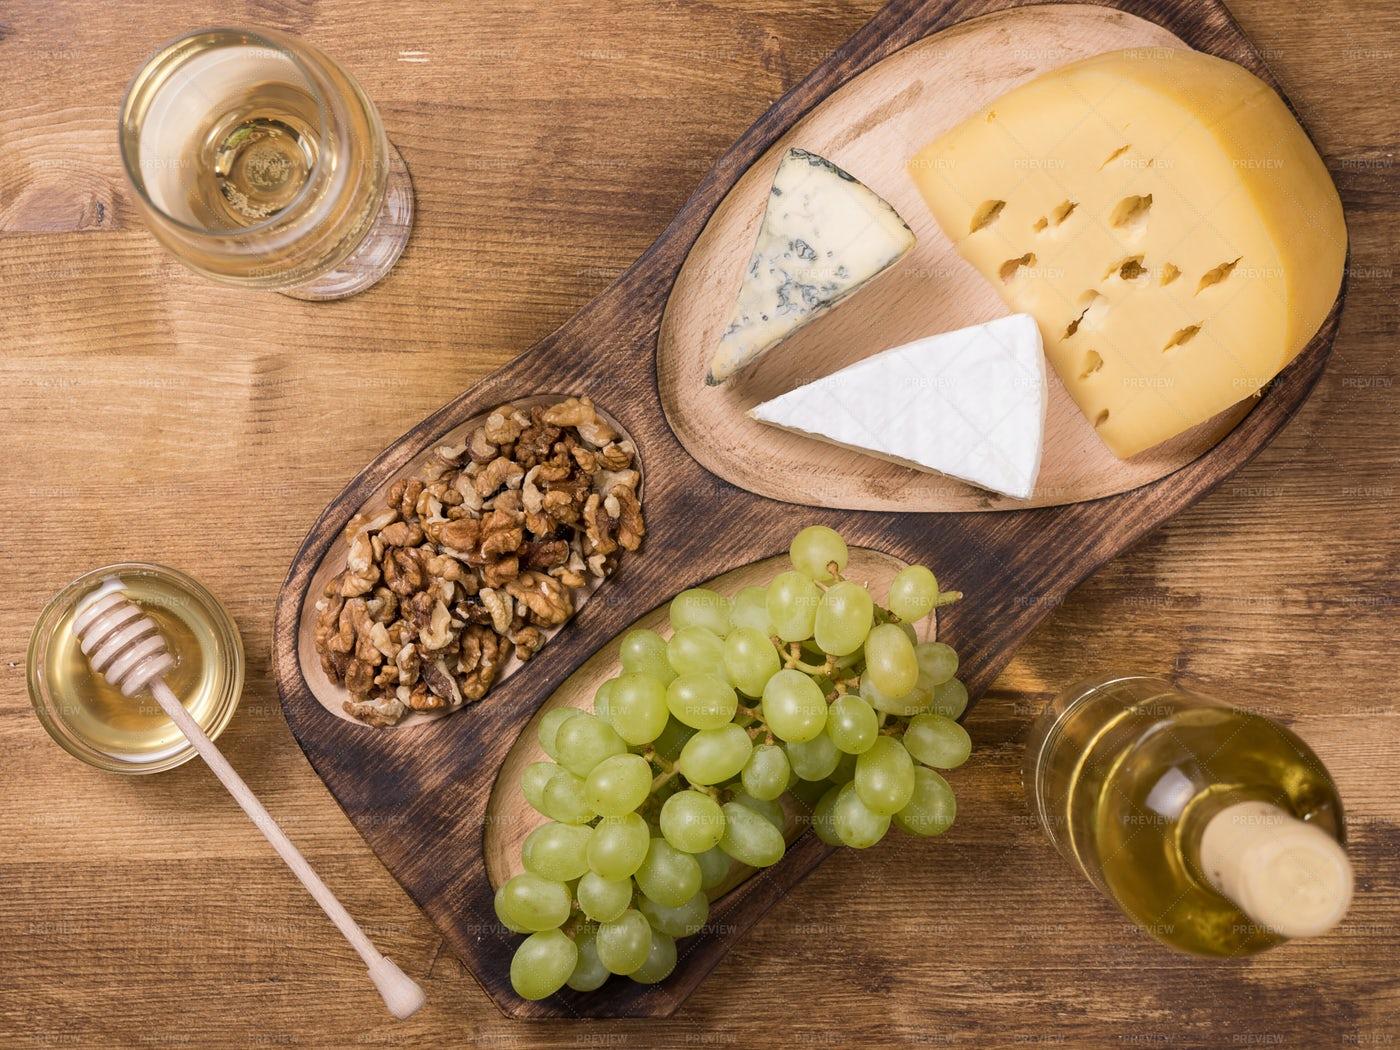 Walnuts, Honey, Grapes, And Cheese: Stock Photos